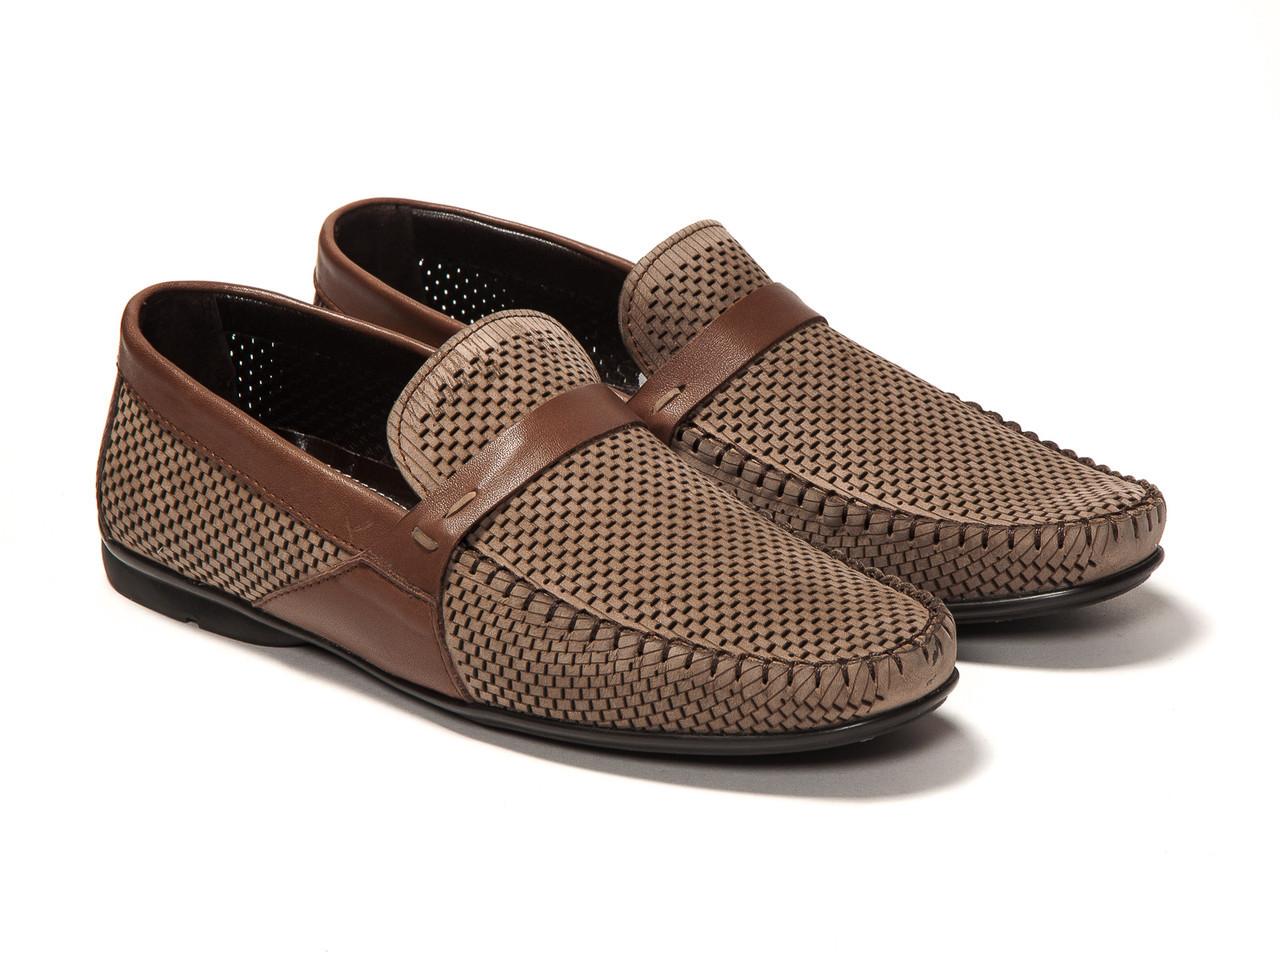 Мокасины Etor 10033-818-755-96-008 42 коричневые